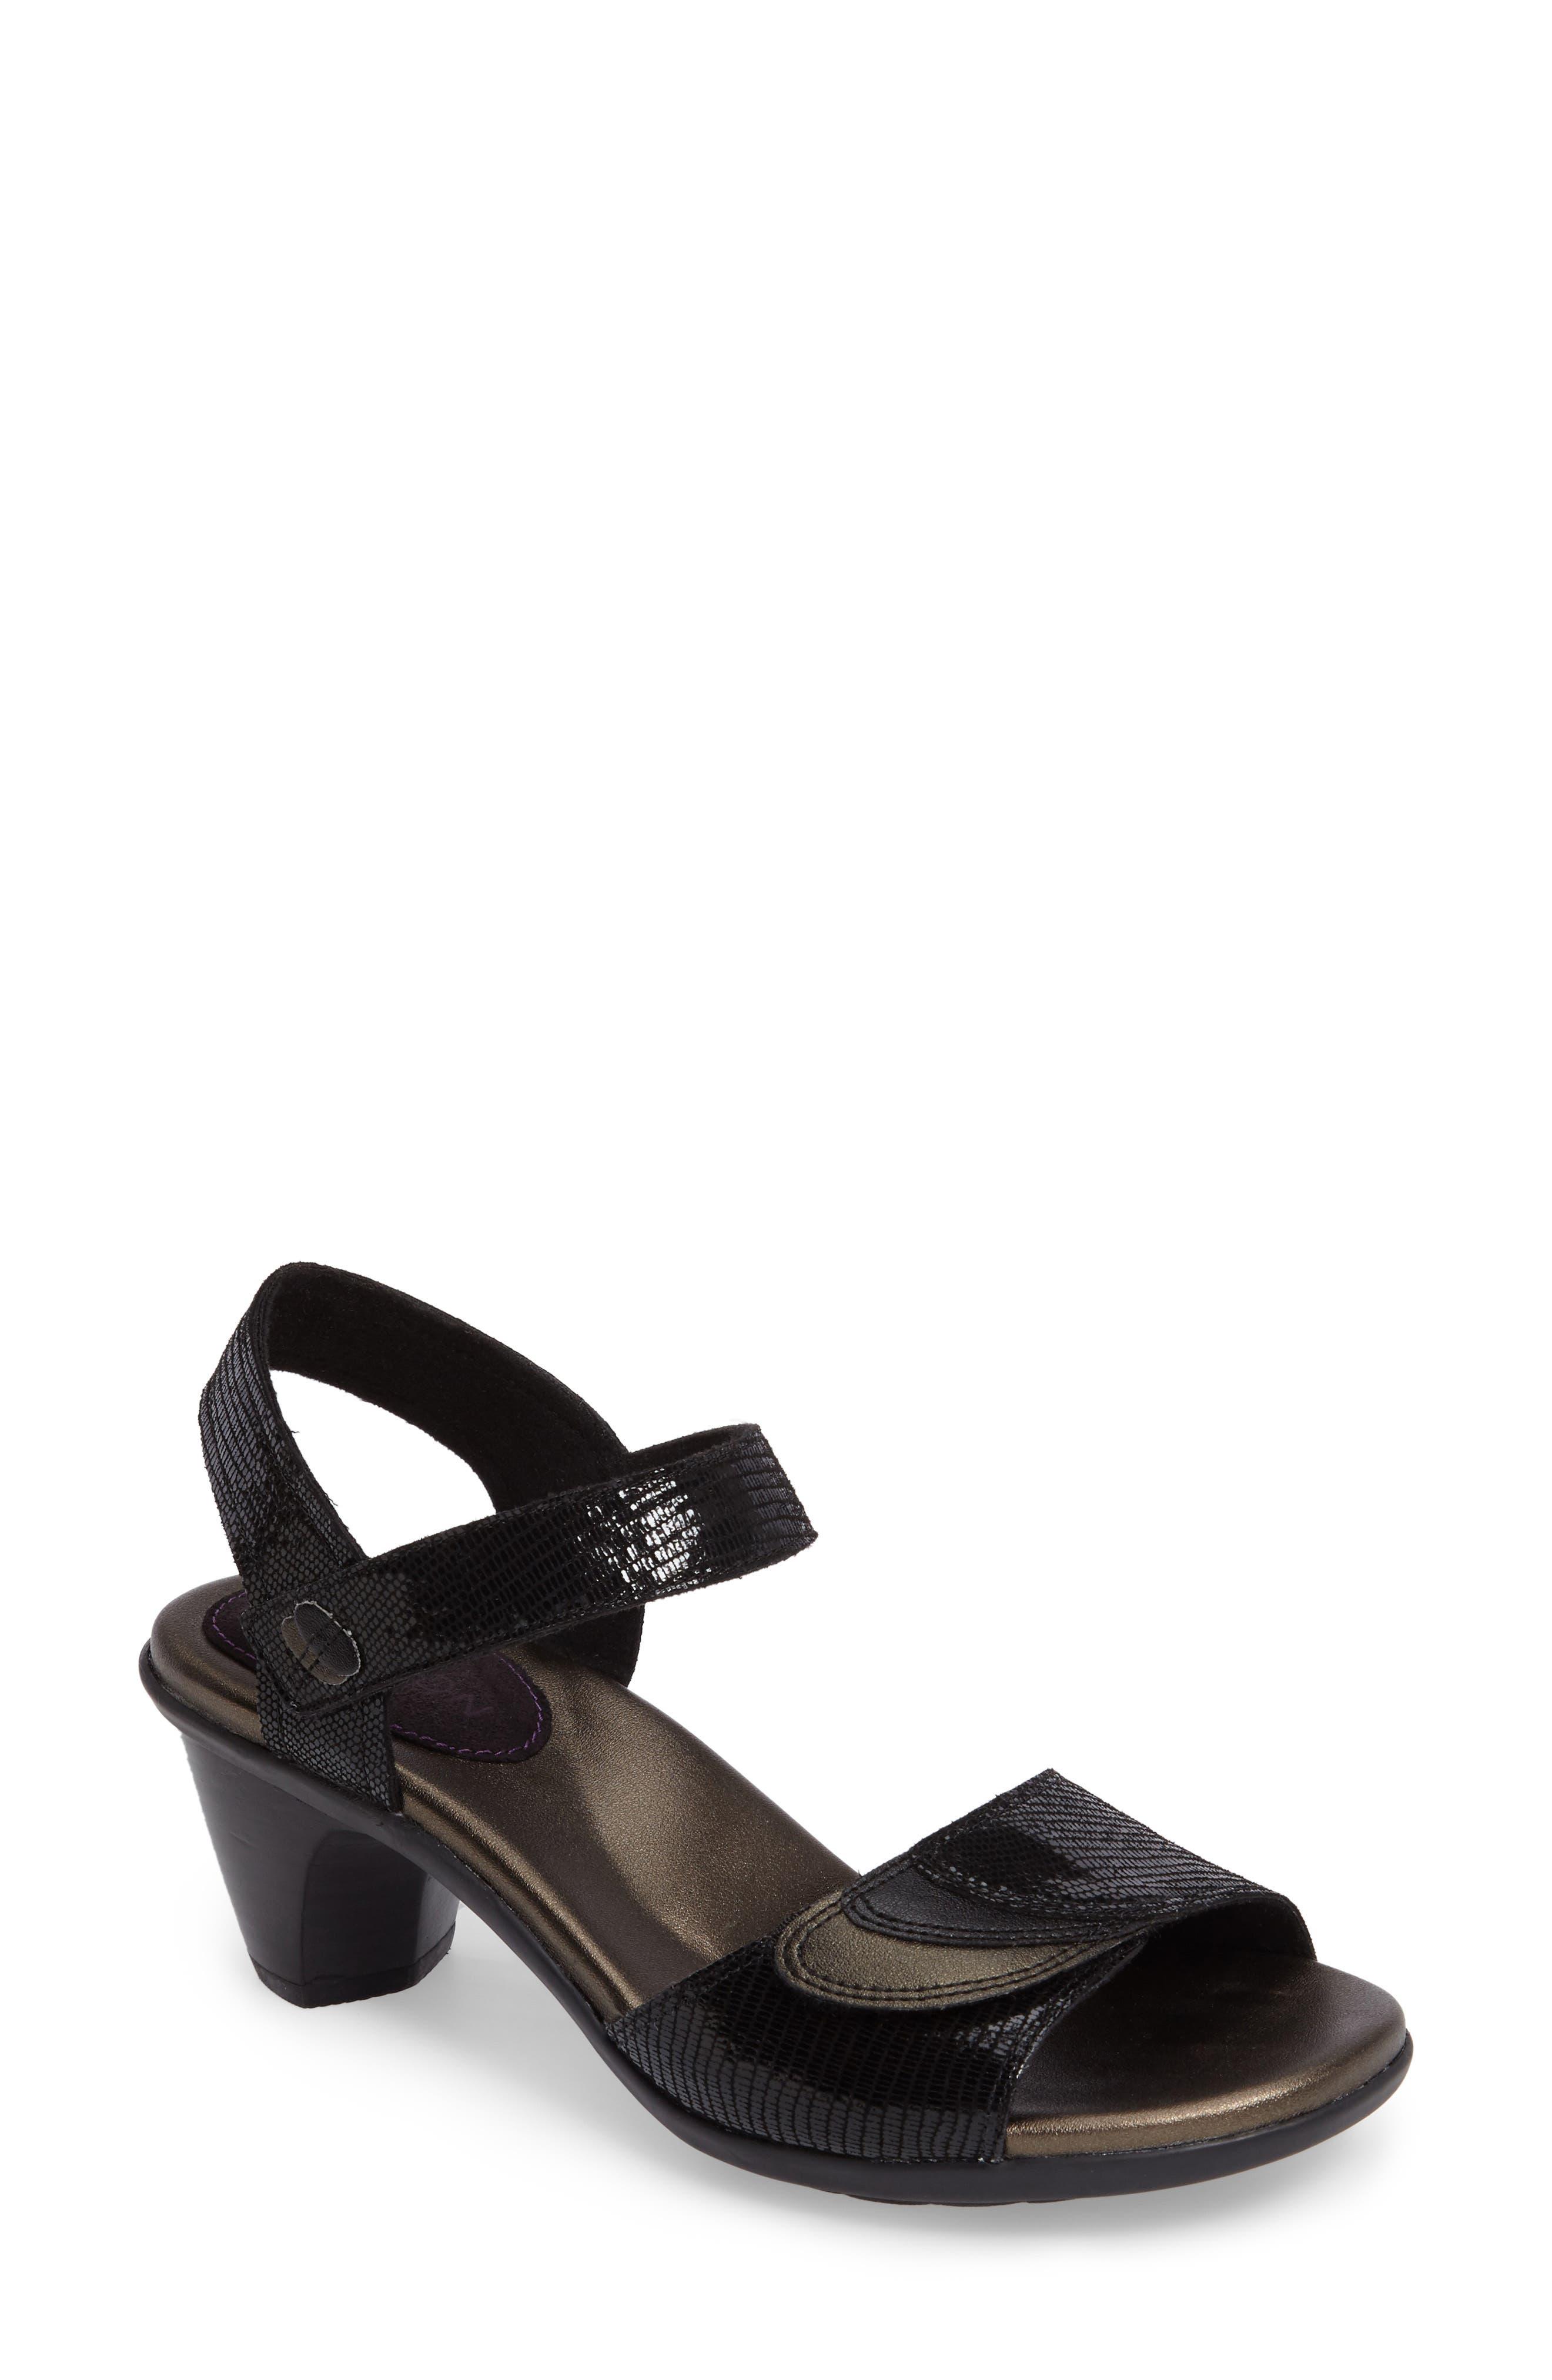 Medici Sandal,                         Main,                         color, BLACK FABRIC